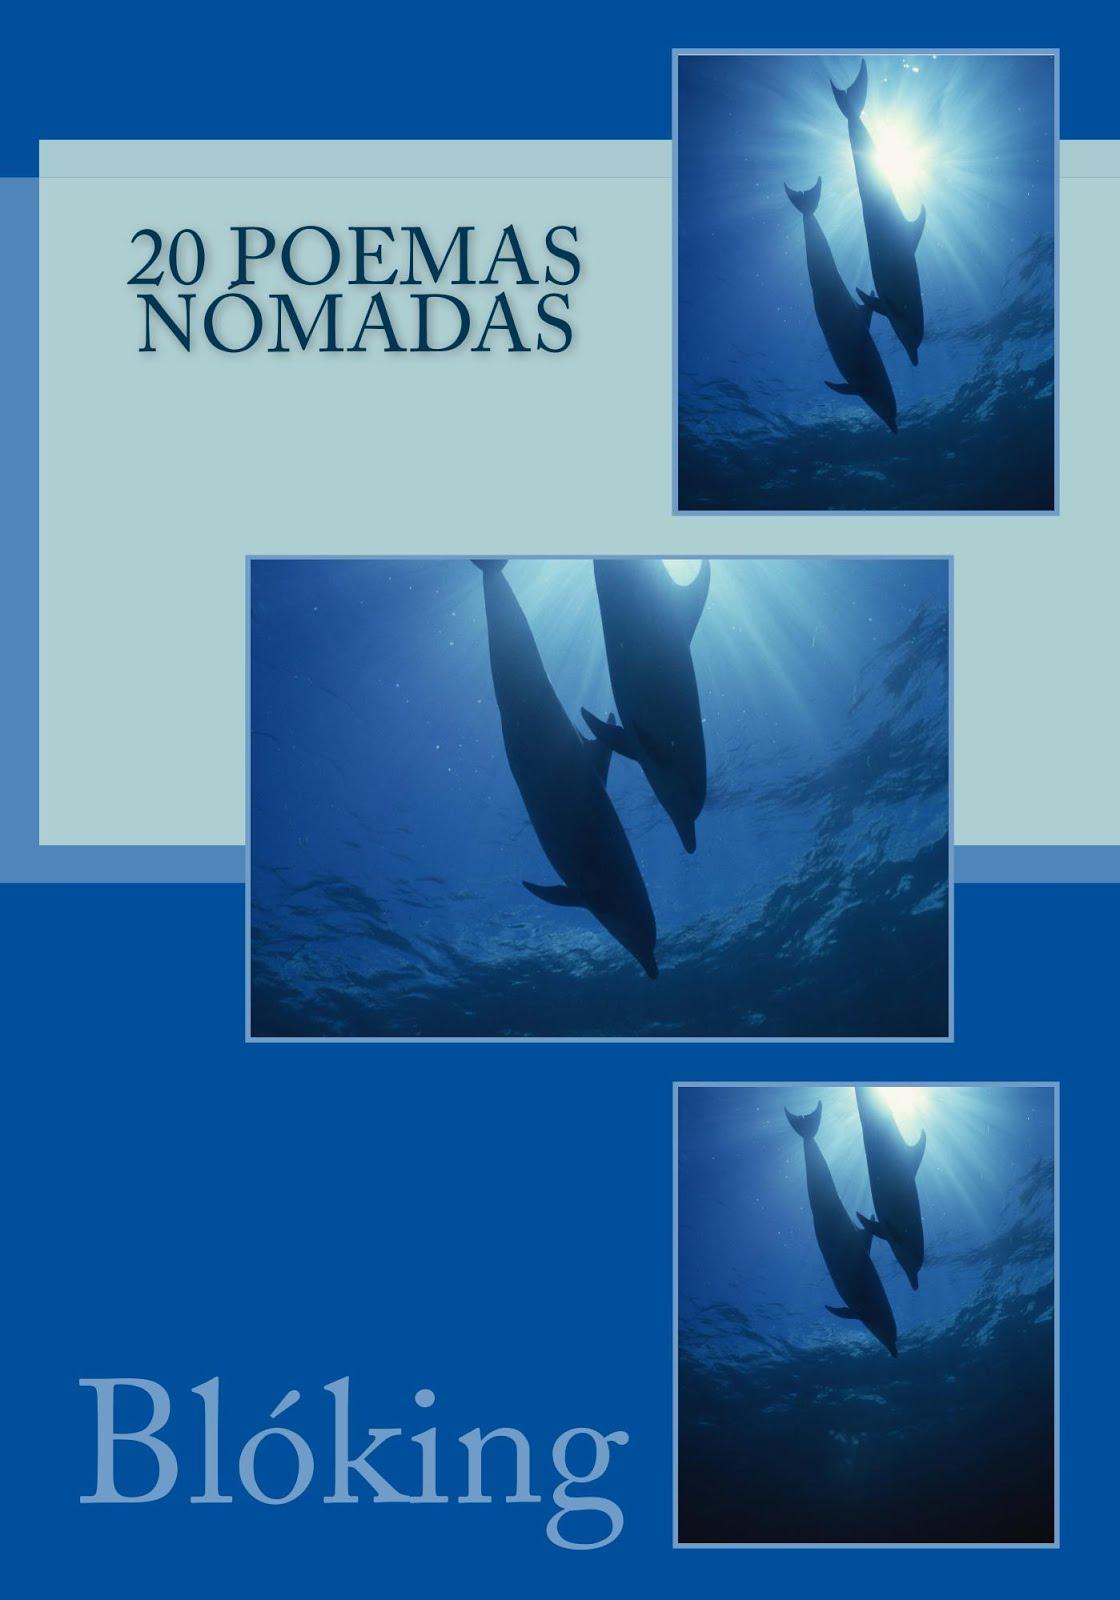 #20 Poemas nómadas (en papel, tapa blanda)